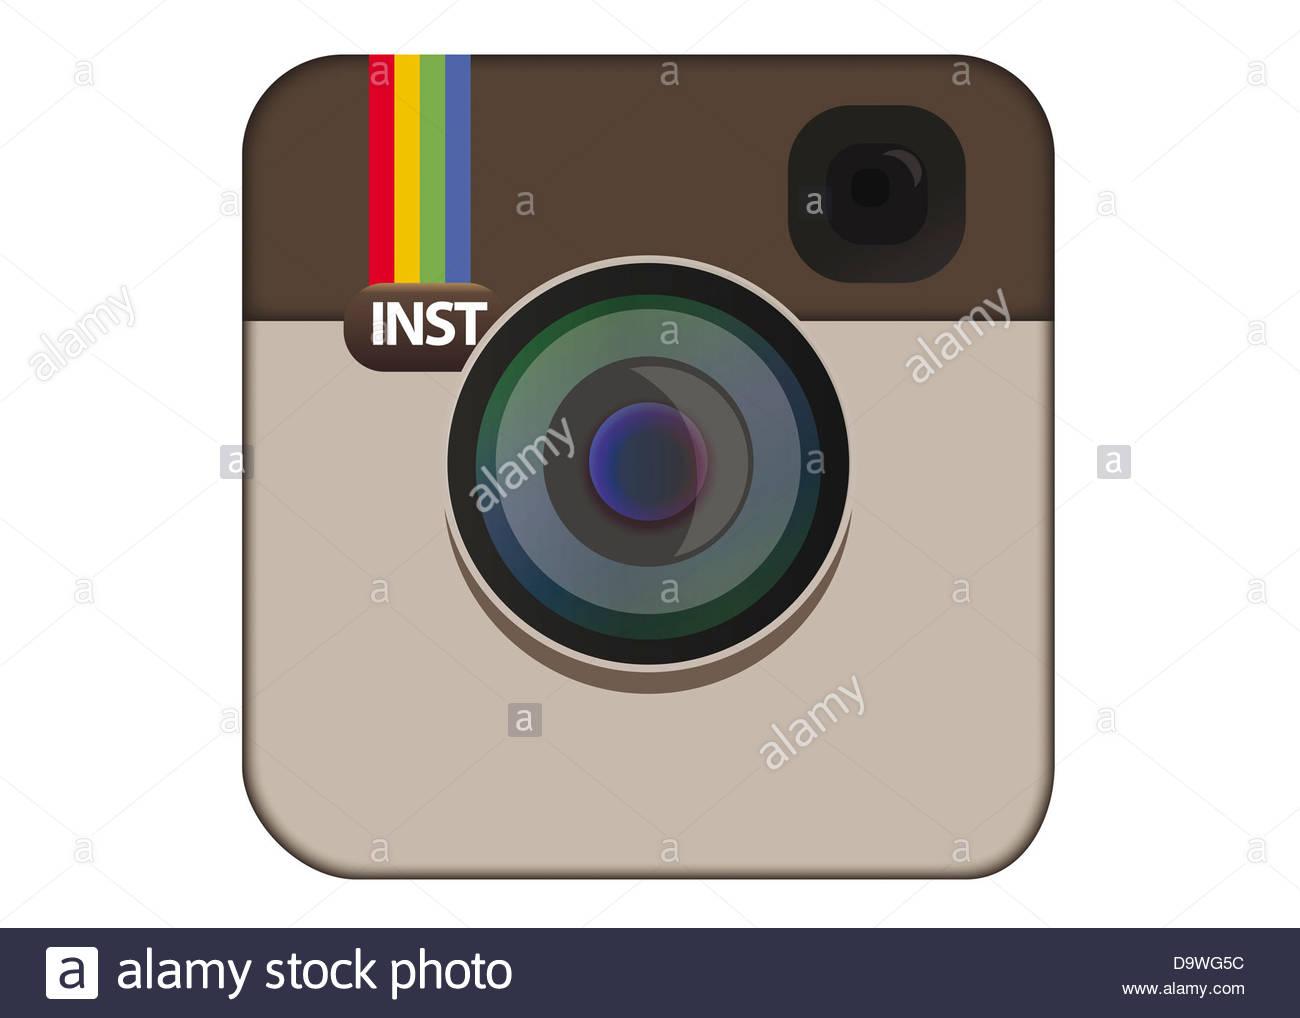 Instagram logo symbol icon flag - Stock Image